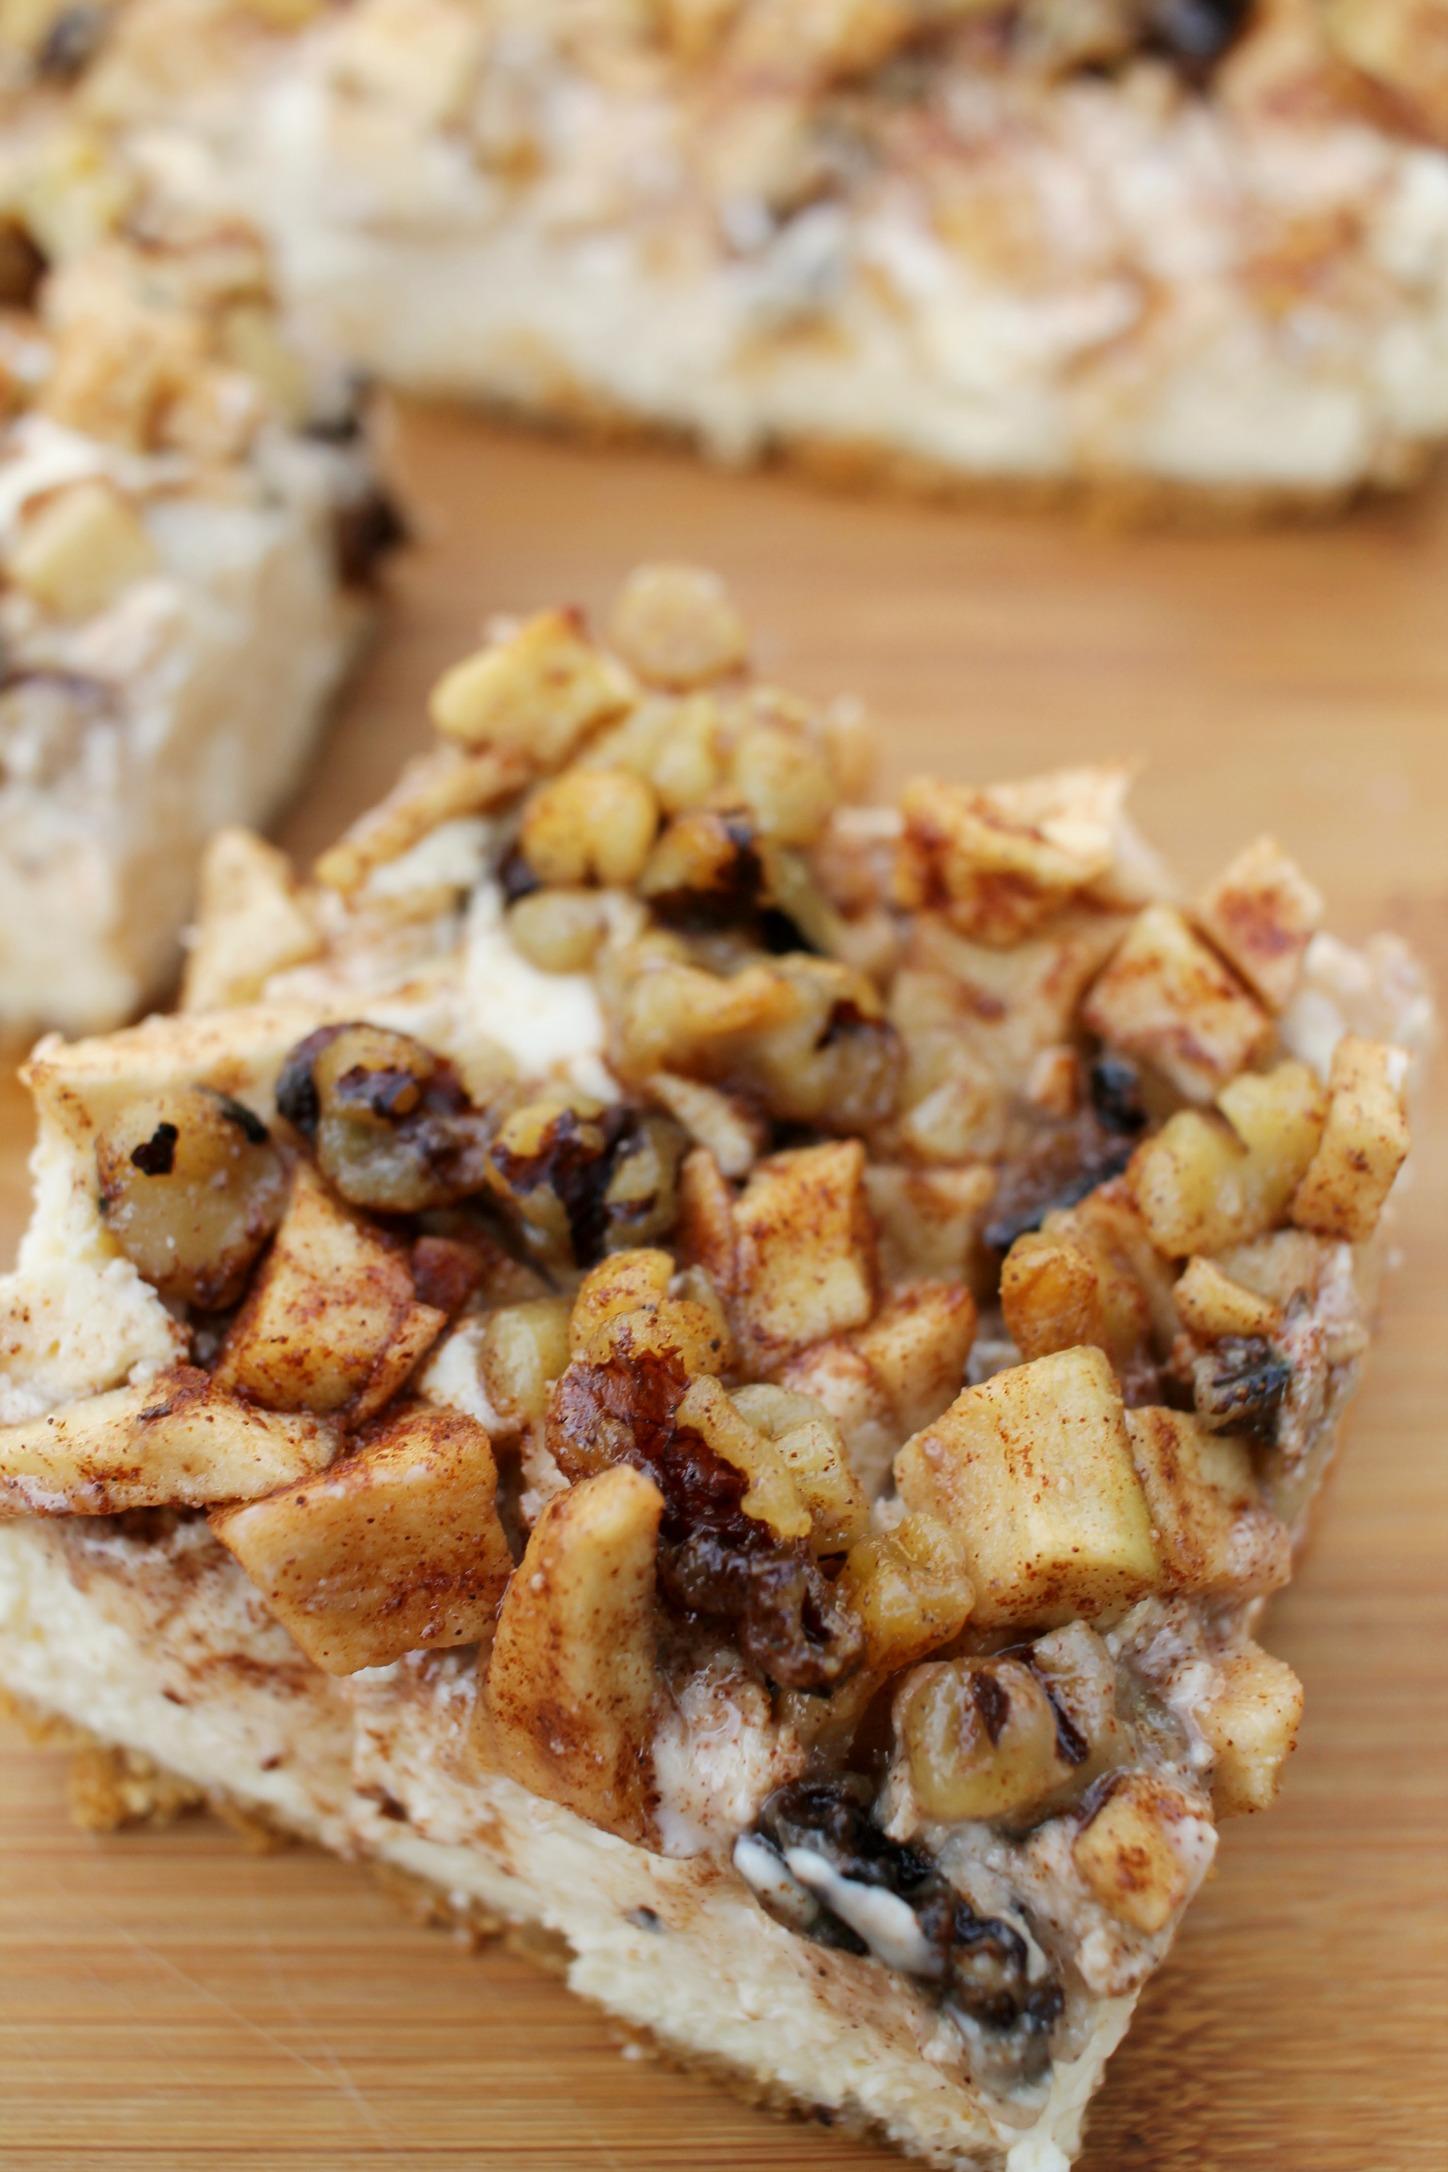 Apple Walnut Cheesecake Bar up close